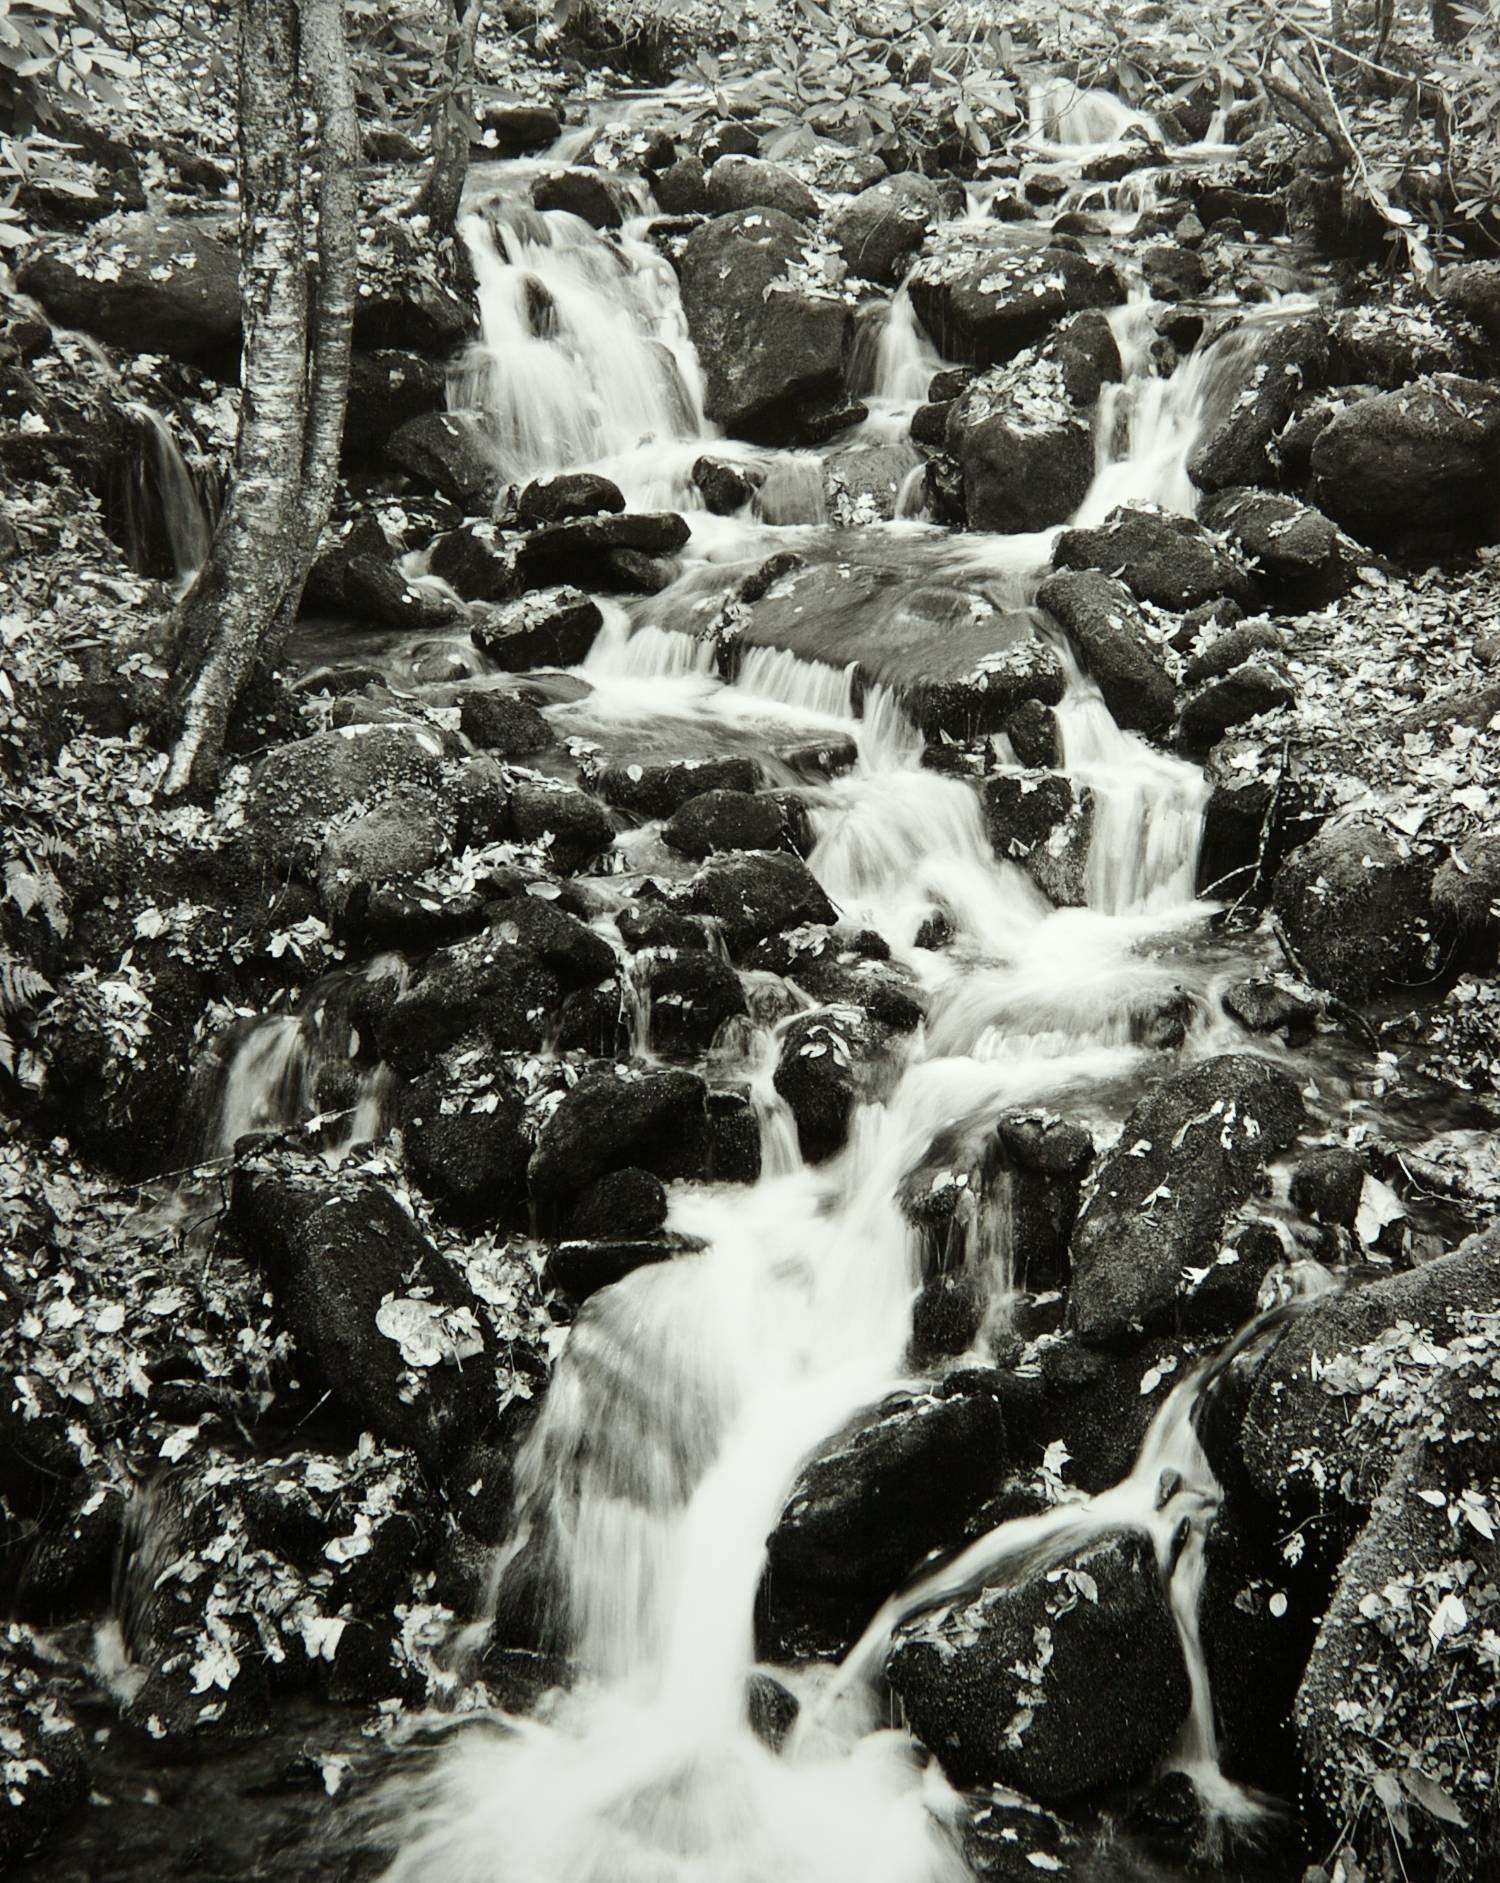 Autumn Waterfall (Great Smoky Mountains National Park)